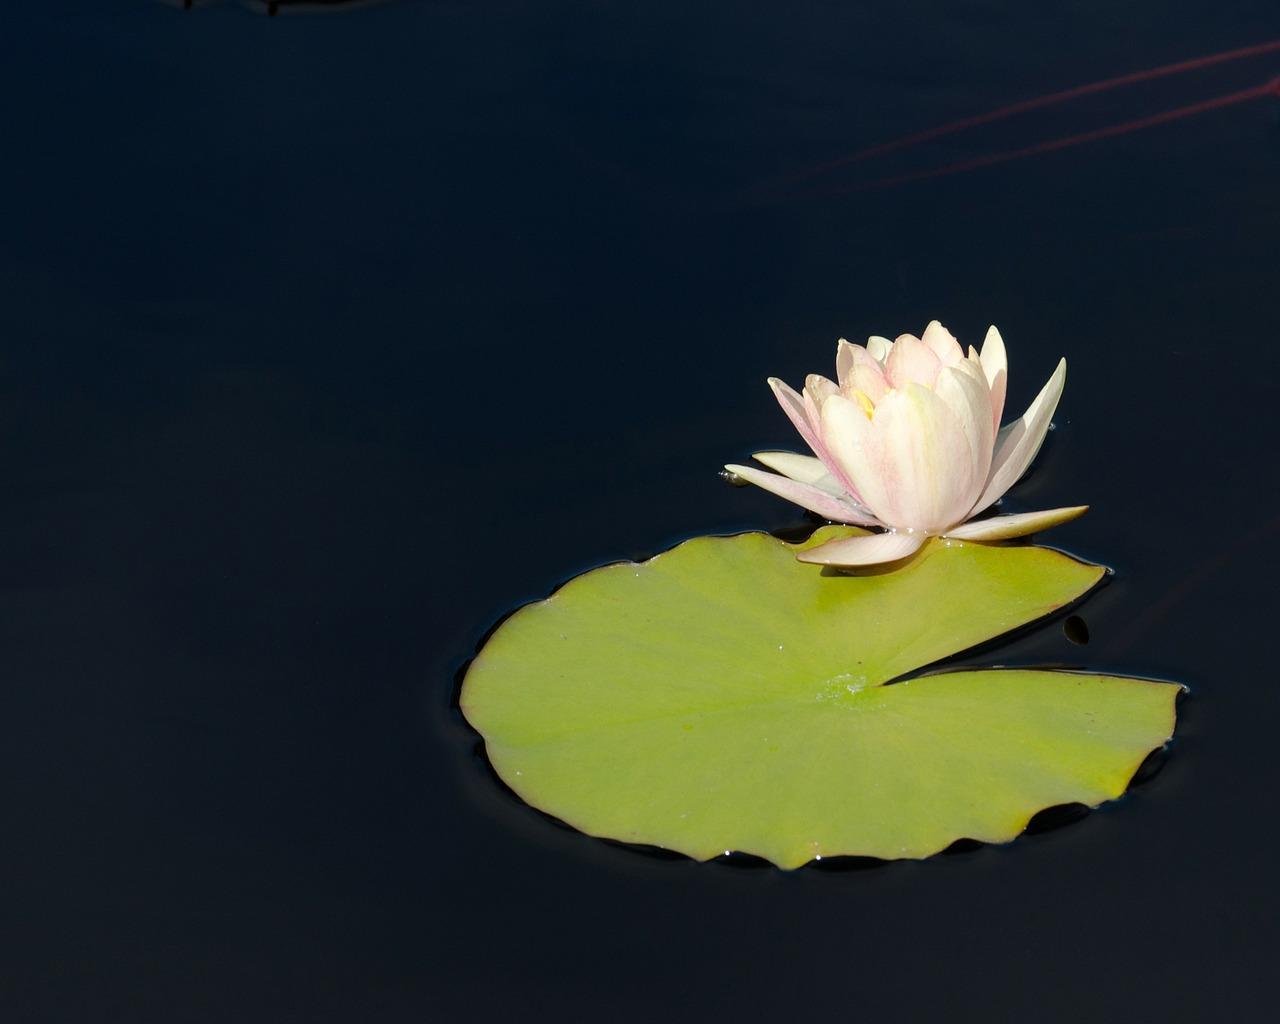 Waterlilyflowerlily padpond flower free photo from needpix waterlilyflowerlily padpond flowerpond plant izmirmasajfo